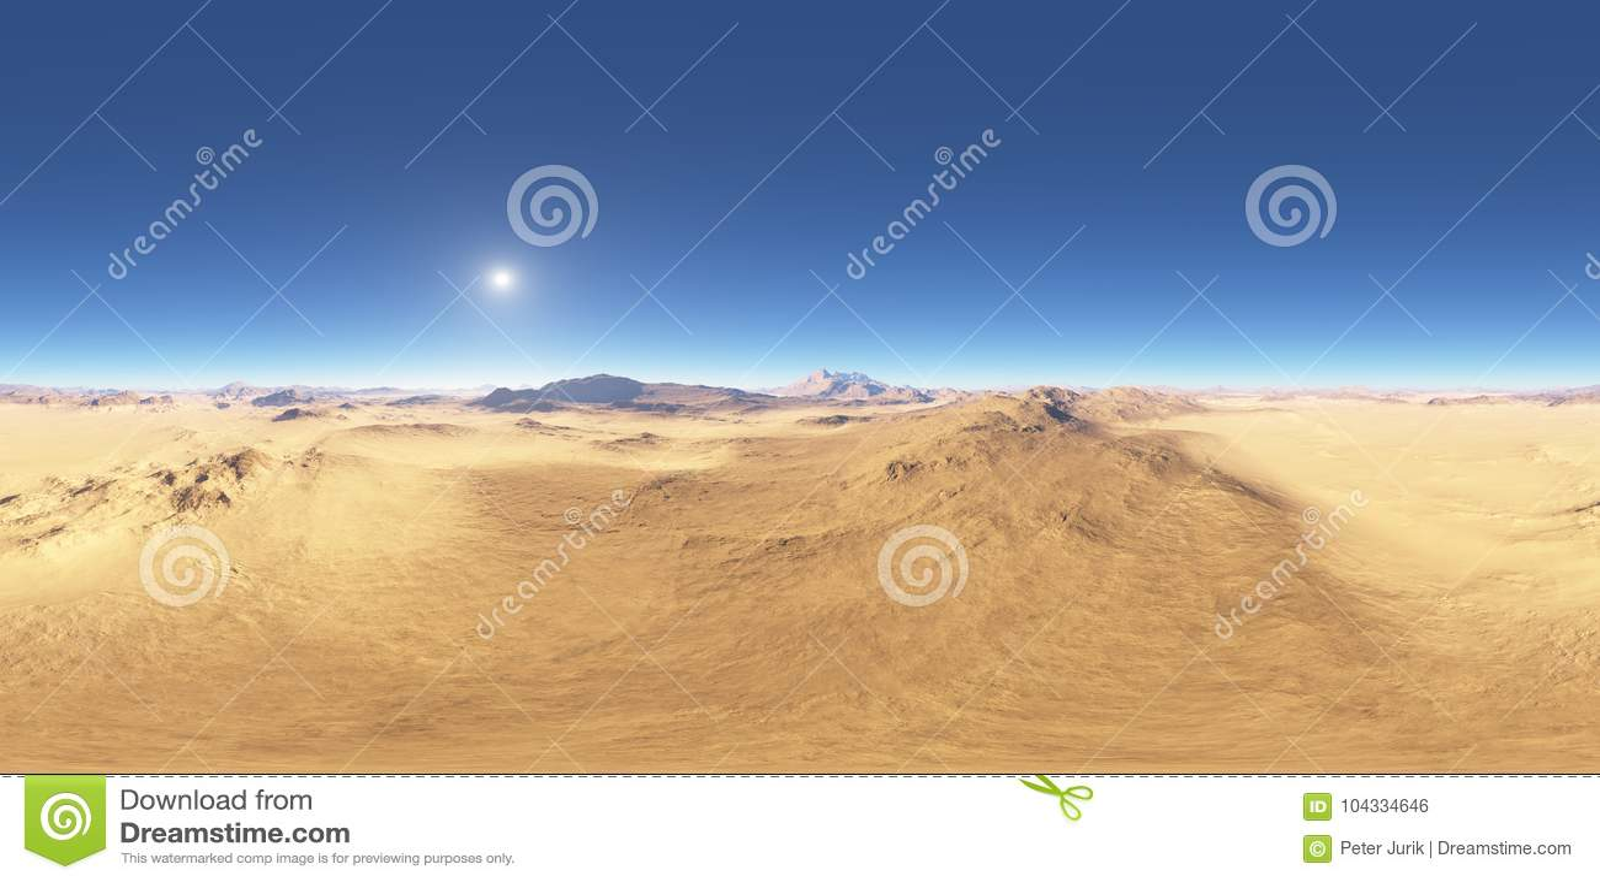 Панорама захода солнца ландшафта пустыни, карты окружающей среды HDRI Проекция Equirectangular, сферически панорама